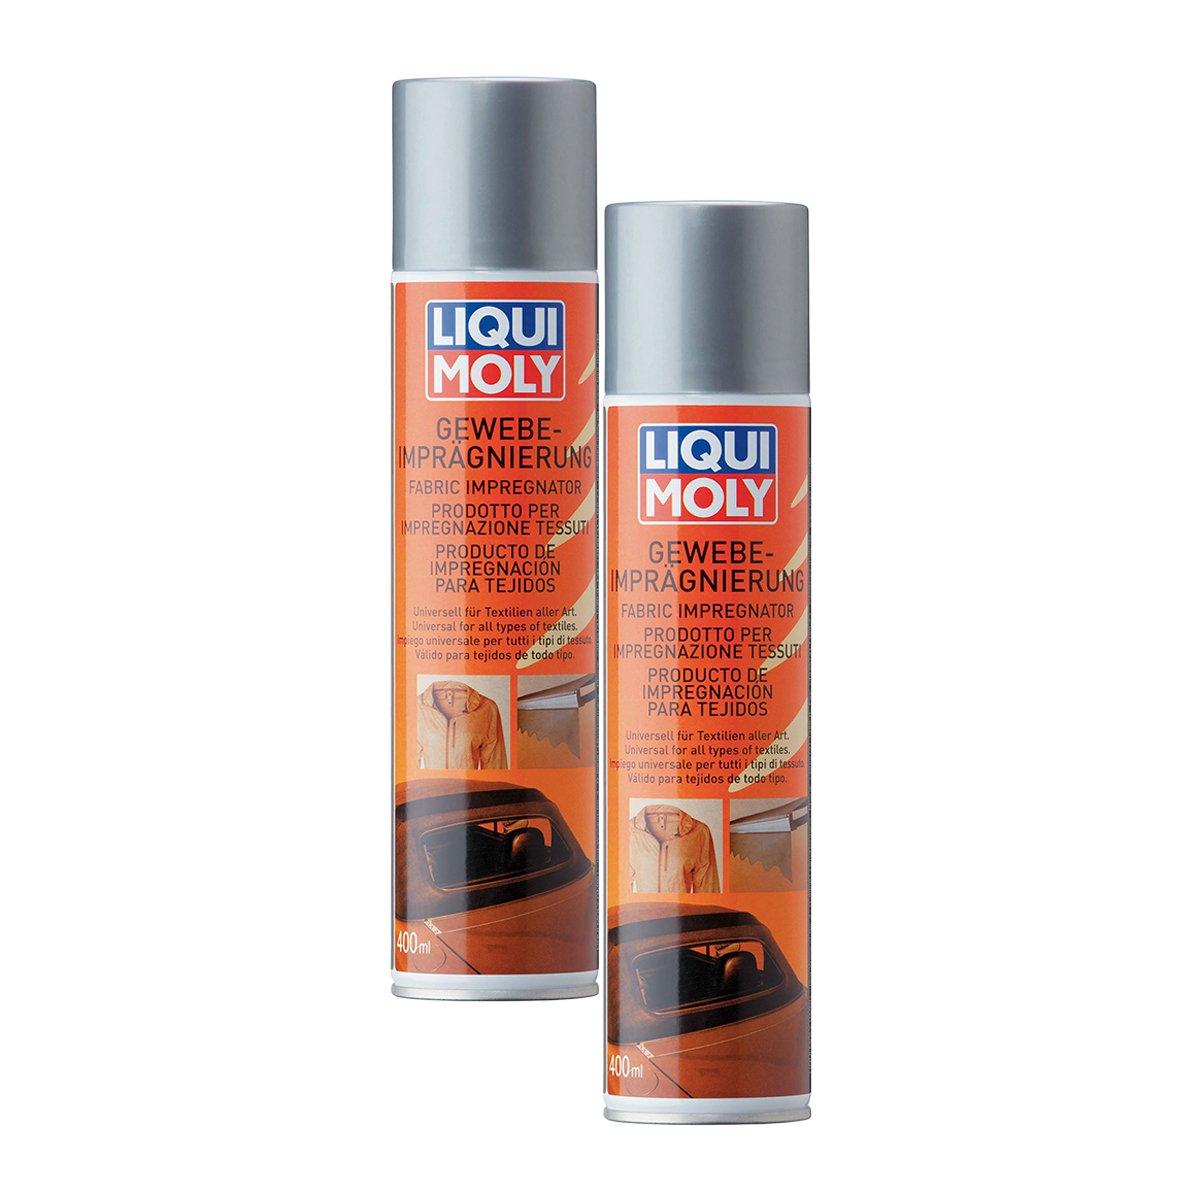 2 x Liqui Moly 1594 tejido impregnació n de espray impermeabilizador Cabrio techo 400 ml